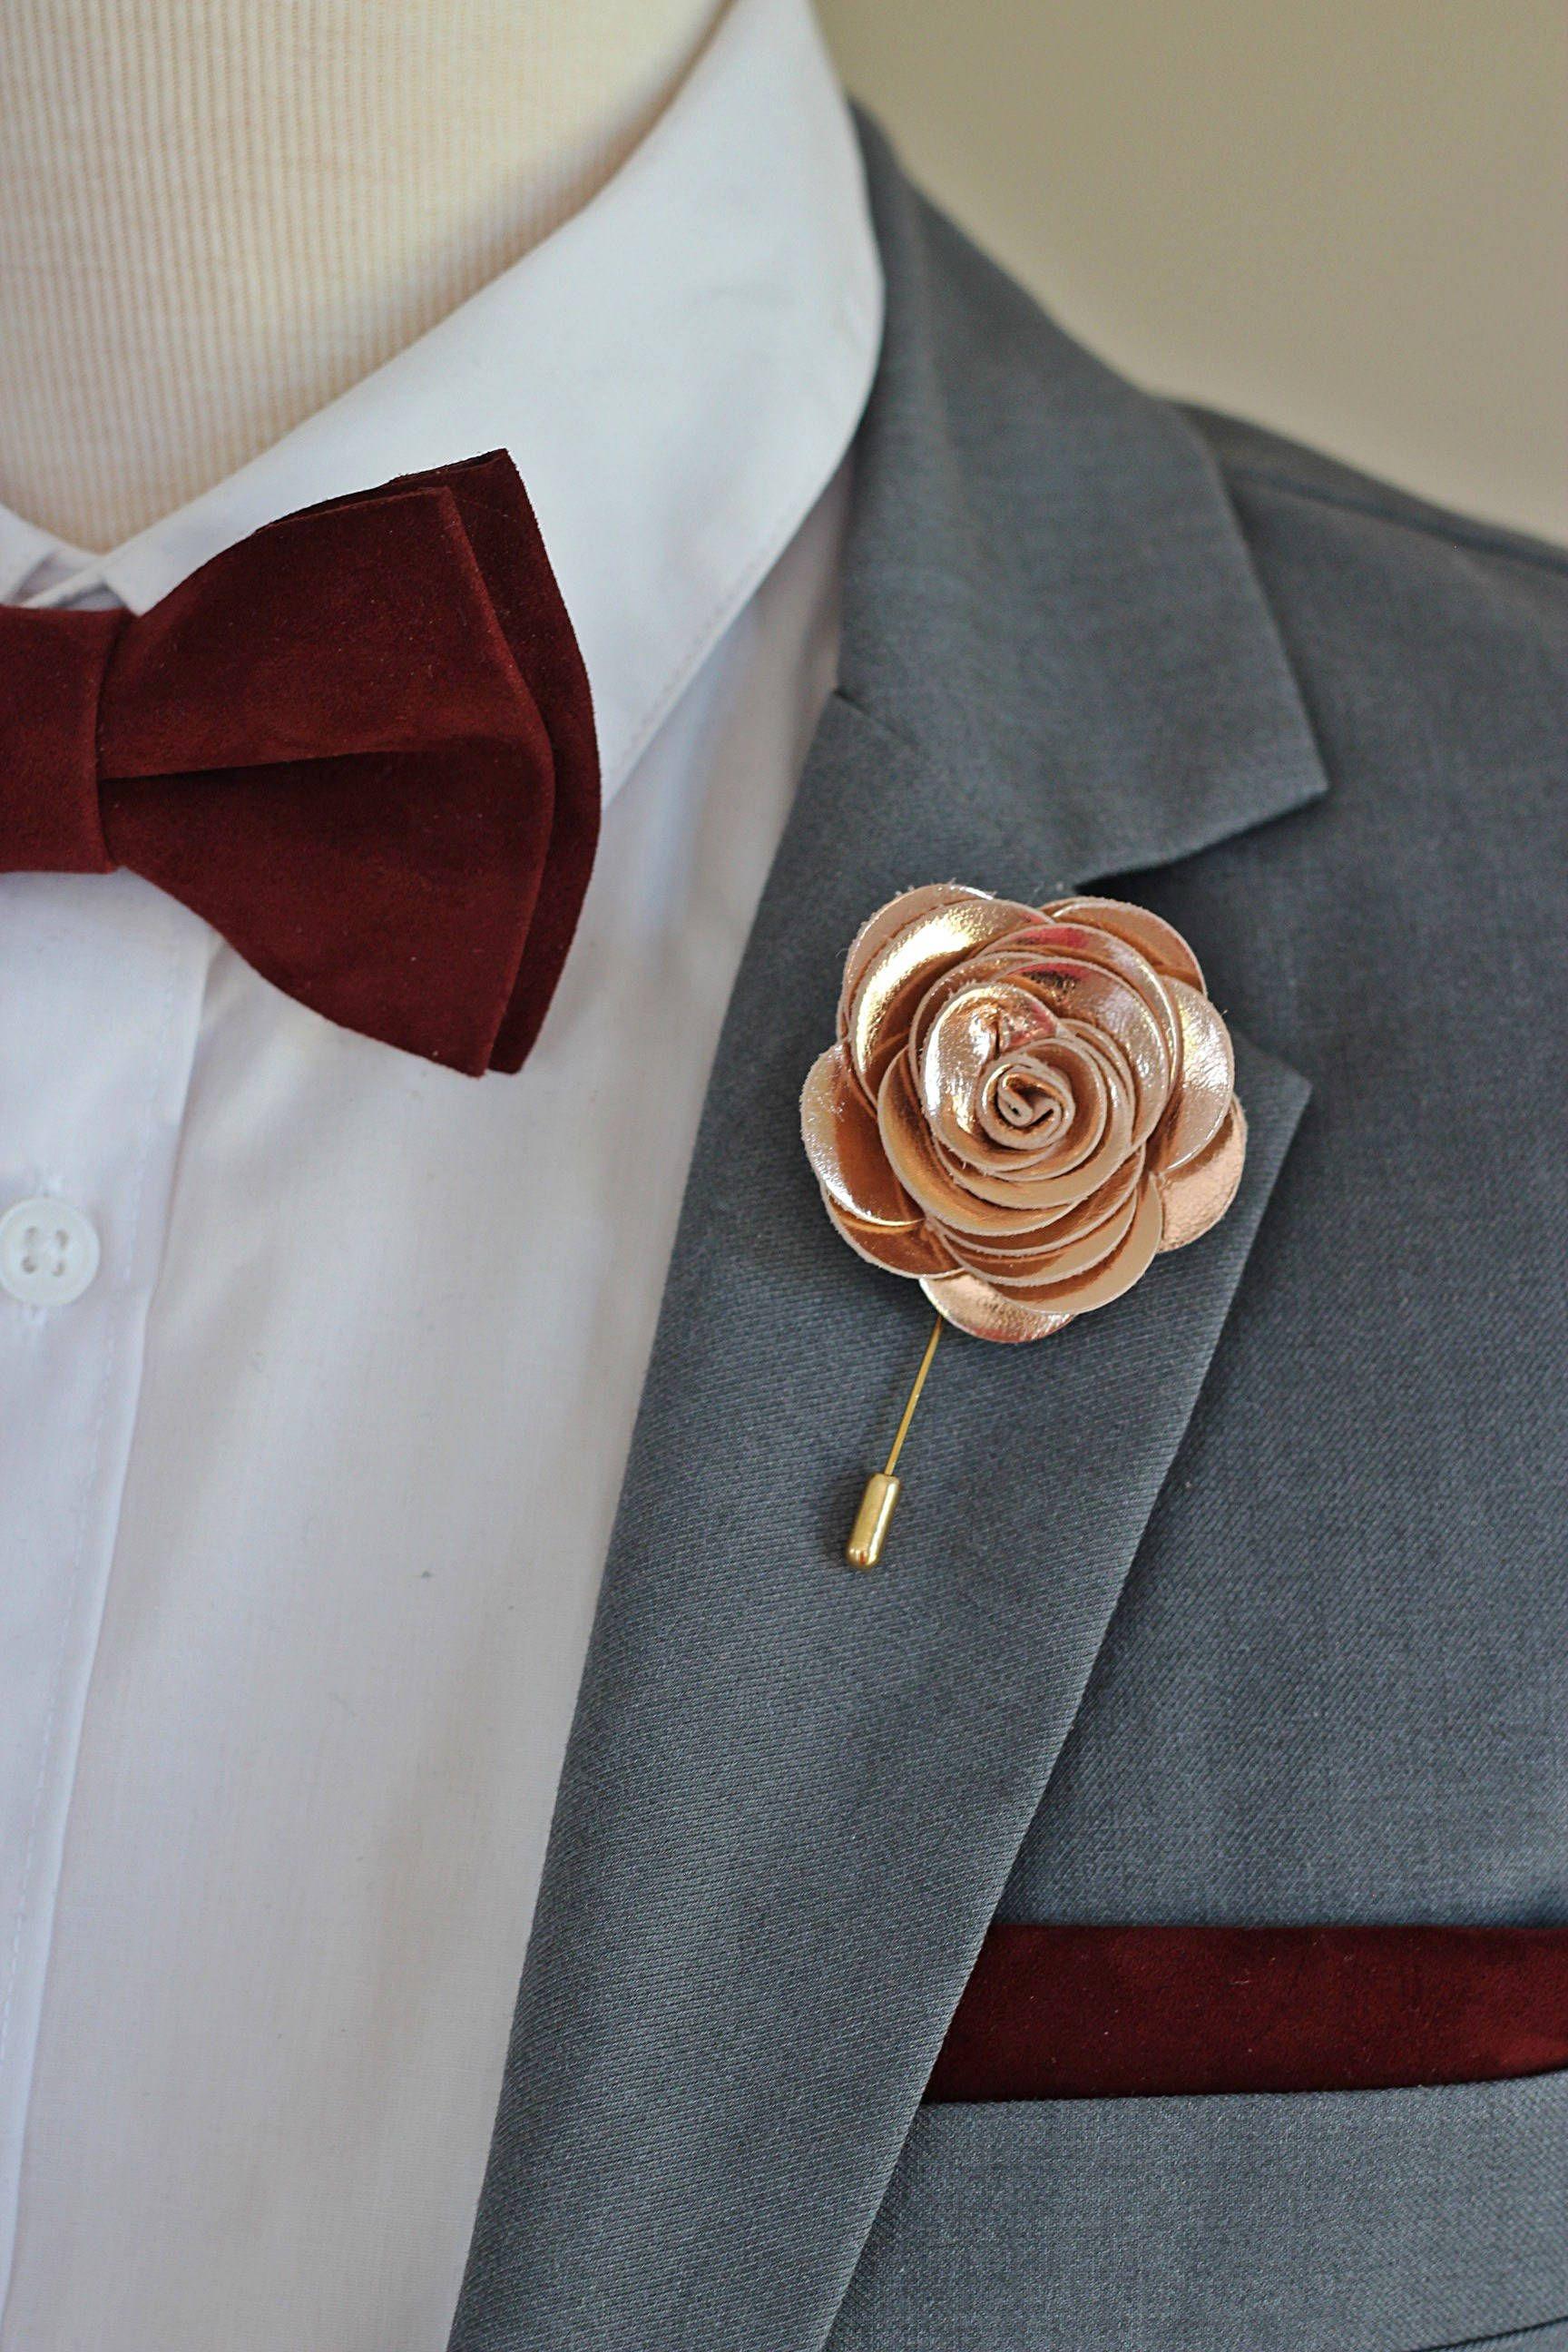 Slim tie - Flowers & leafs in blue, brown & gold on burgundy Notch